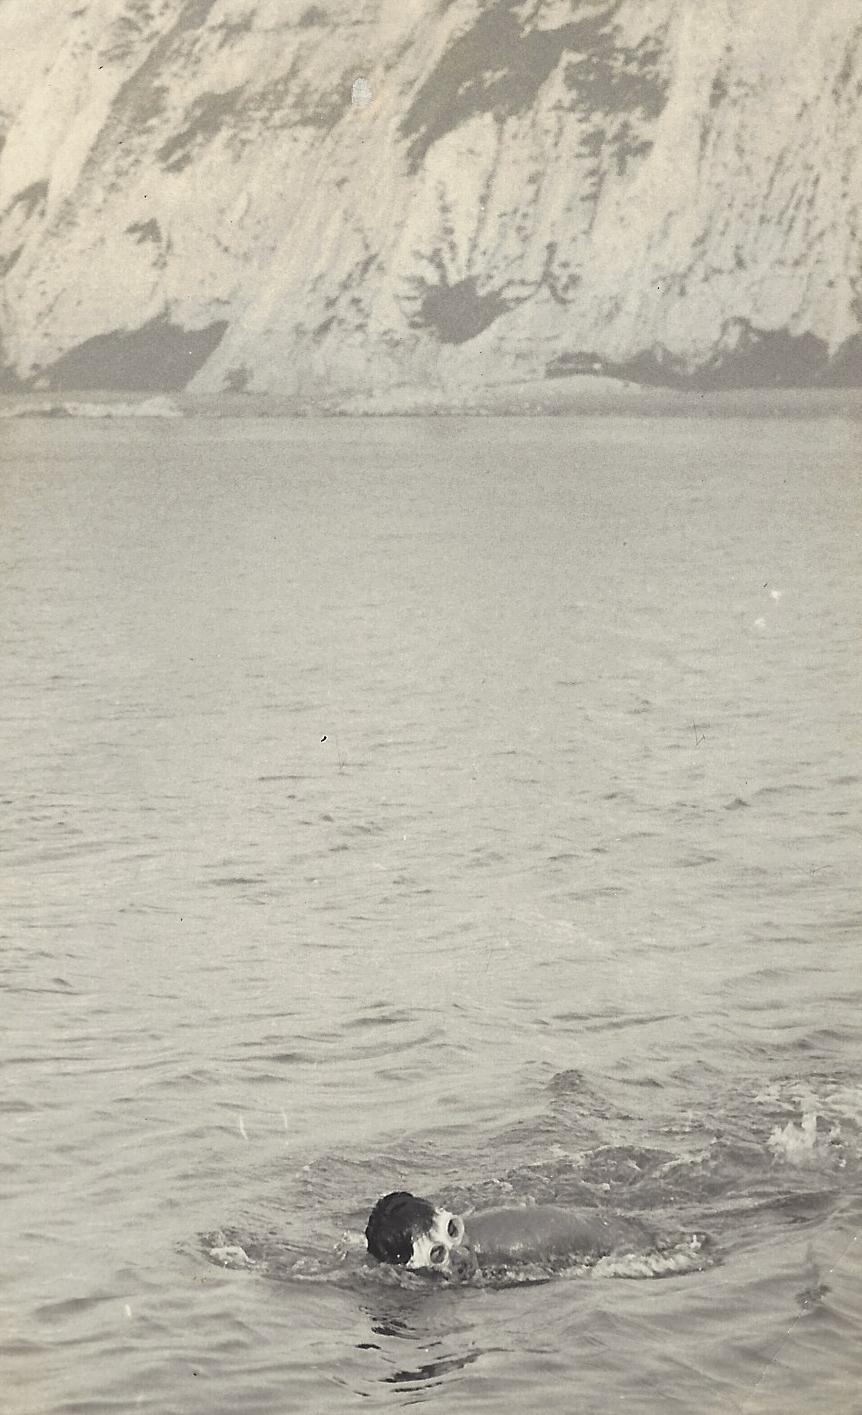 9channel1959.jpg